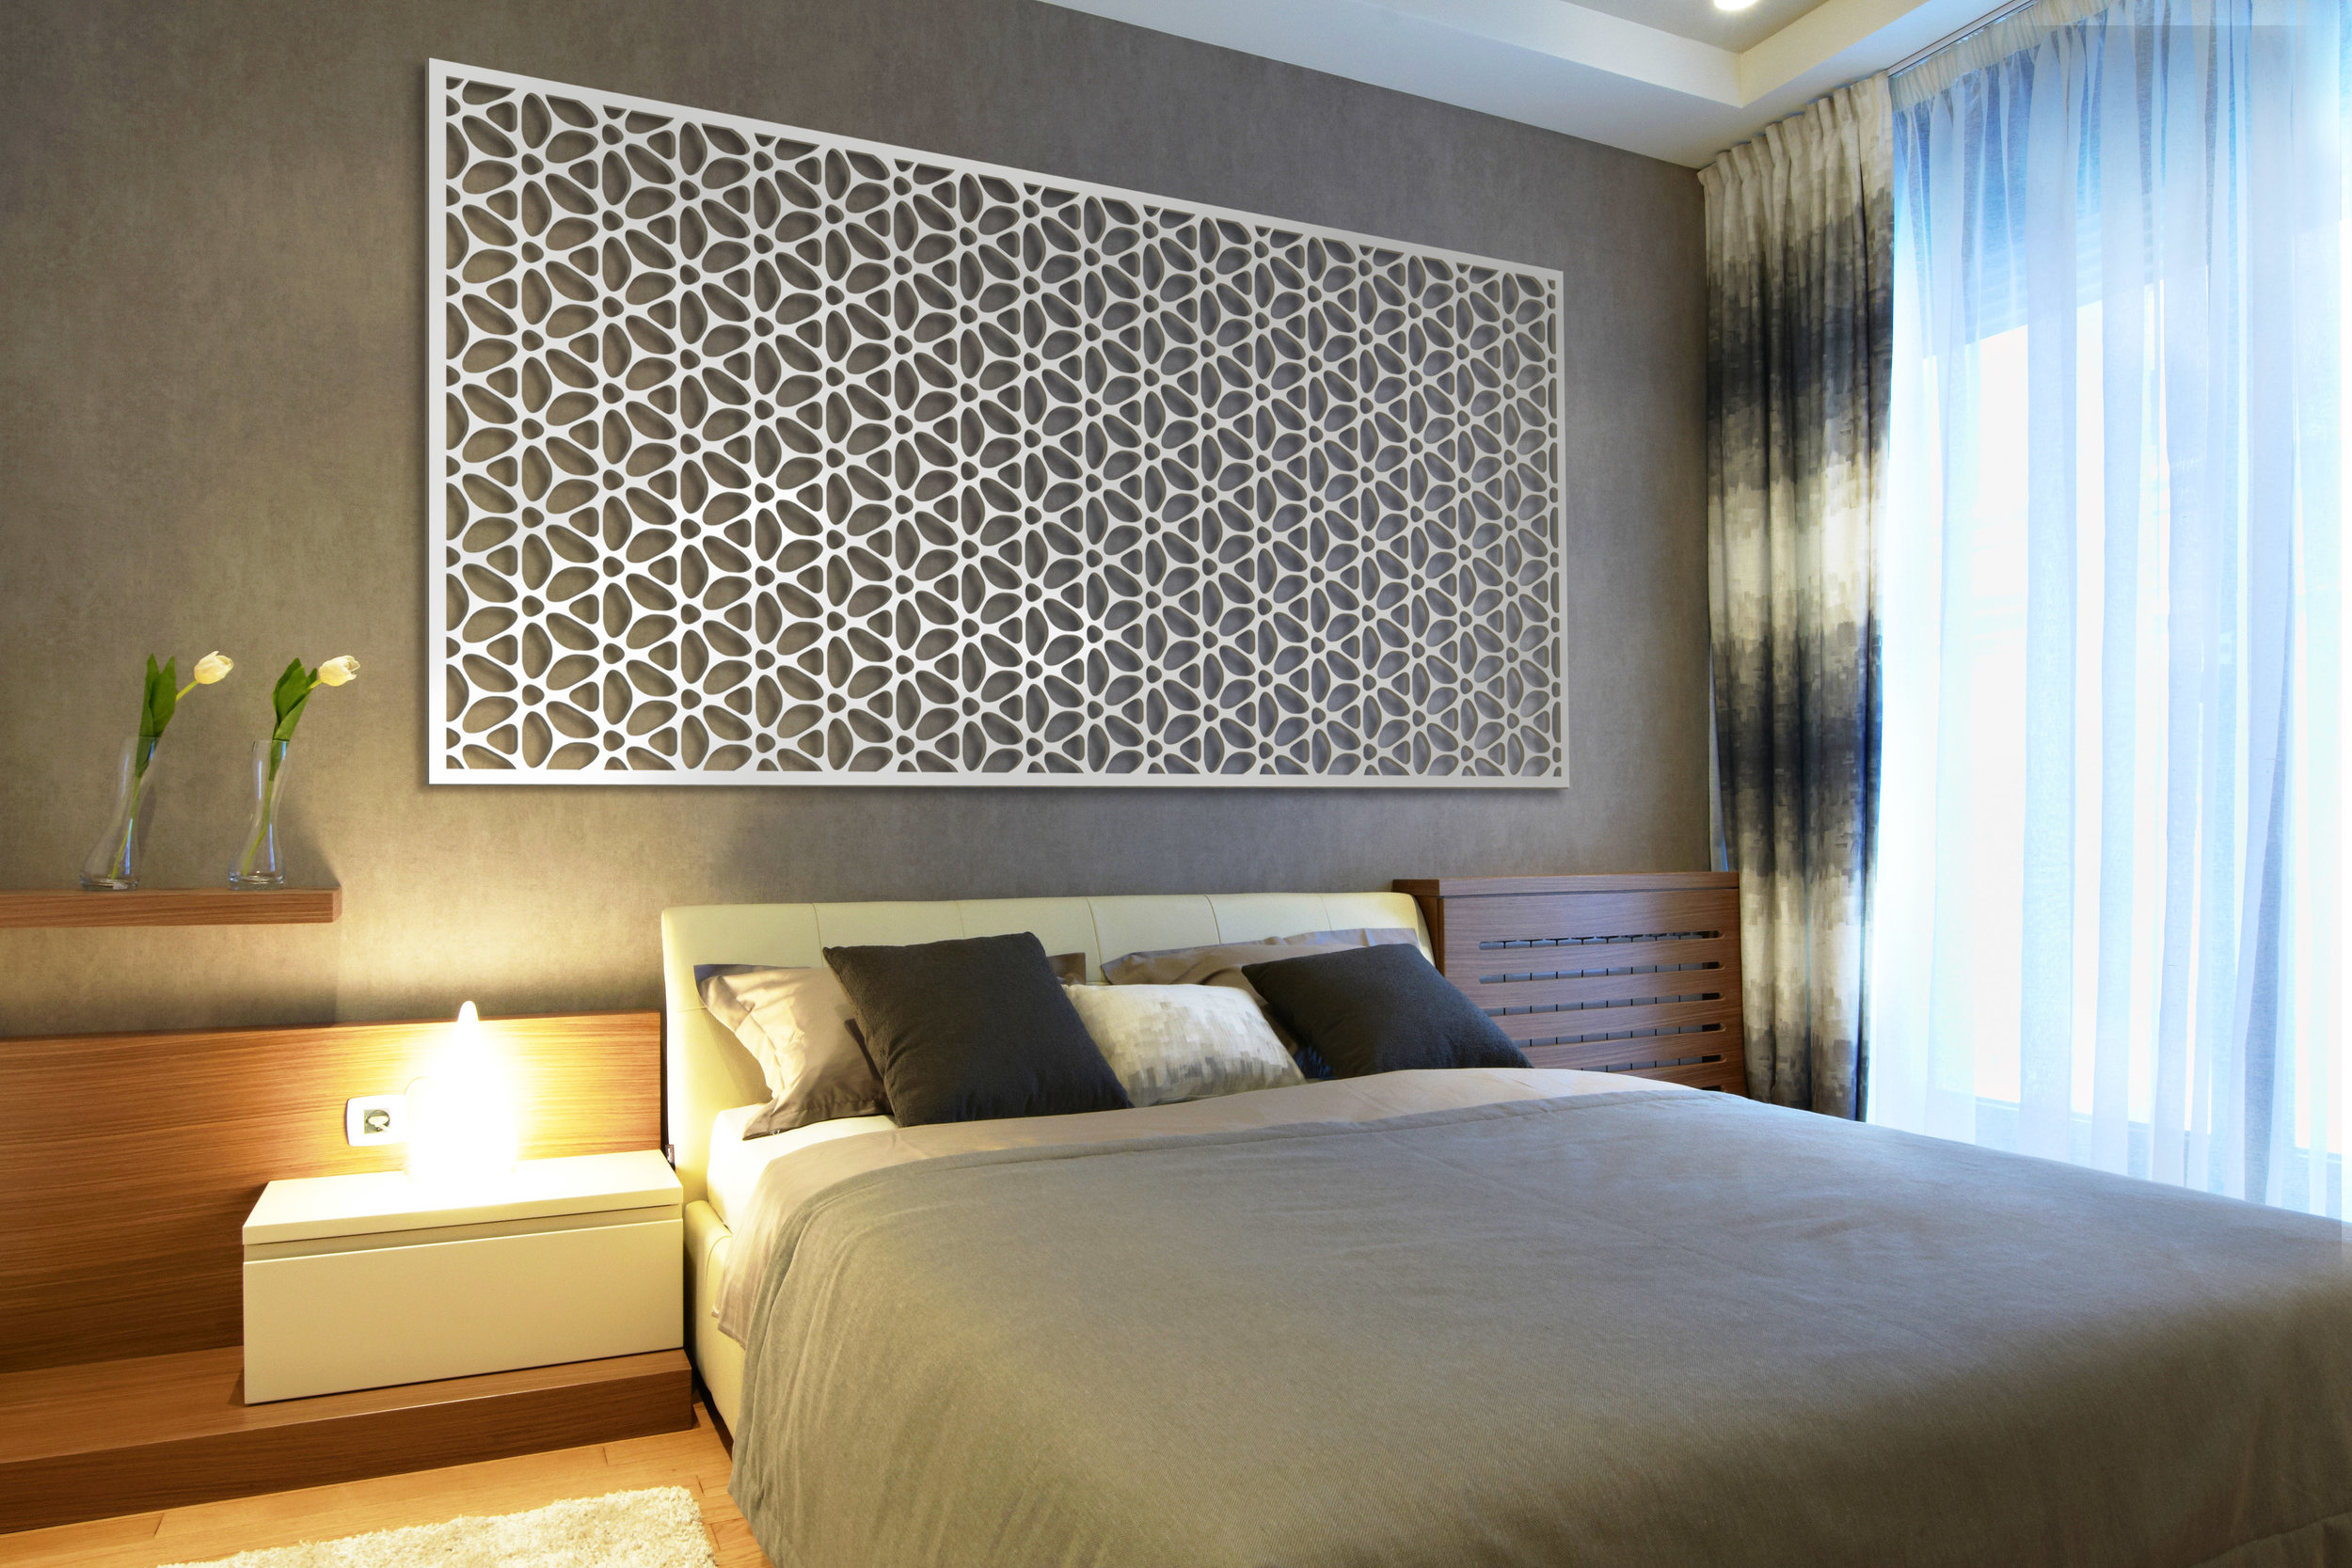 Installation Rendering C   Sao Paulo decorative hotel wall panel - painted